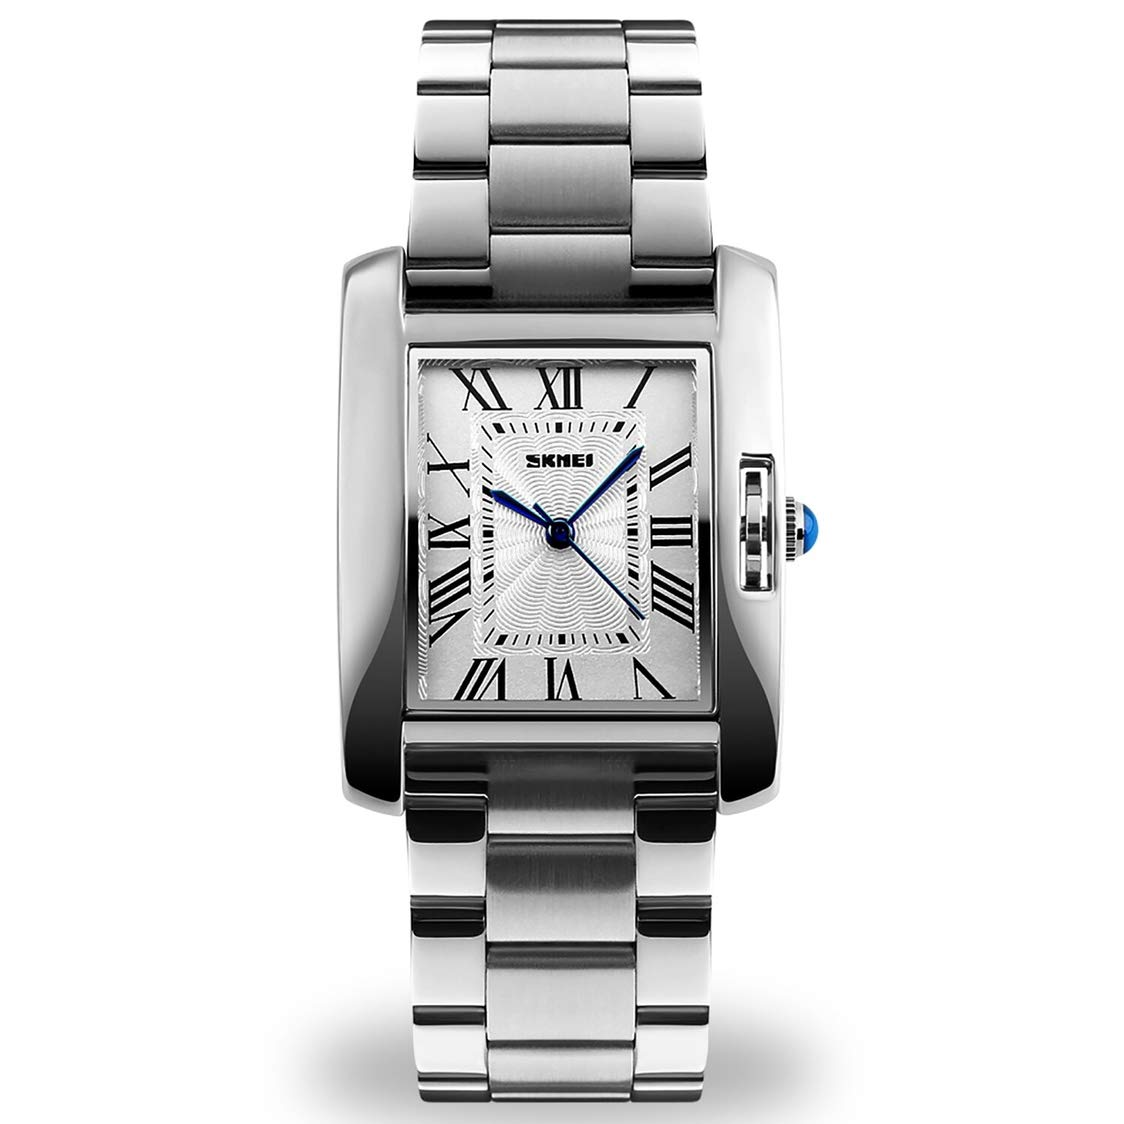 Women Lady Dress Analog Quartz Watch with Stainless Steel Band, Casual Fashion Waterproof Watches Roman Numeral Diamond Rhinestone Luminous Wristwatch Silver